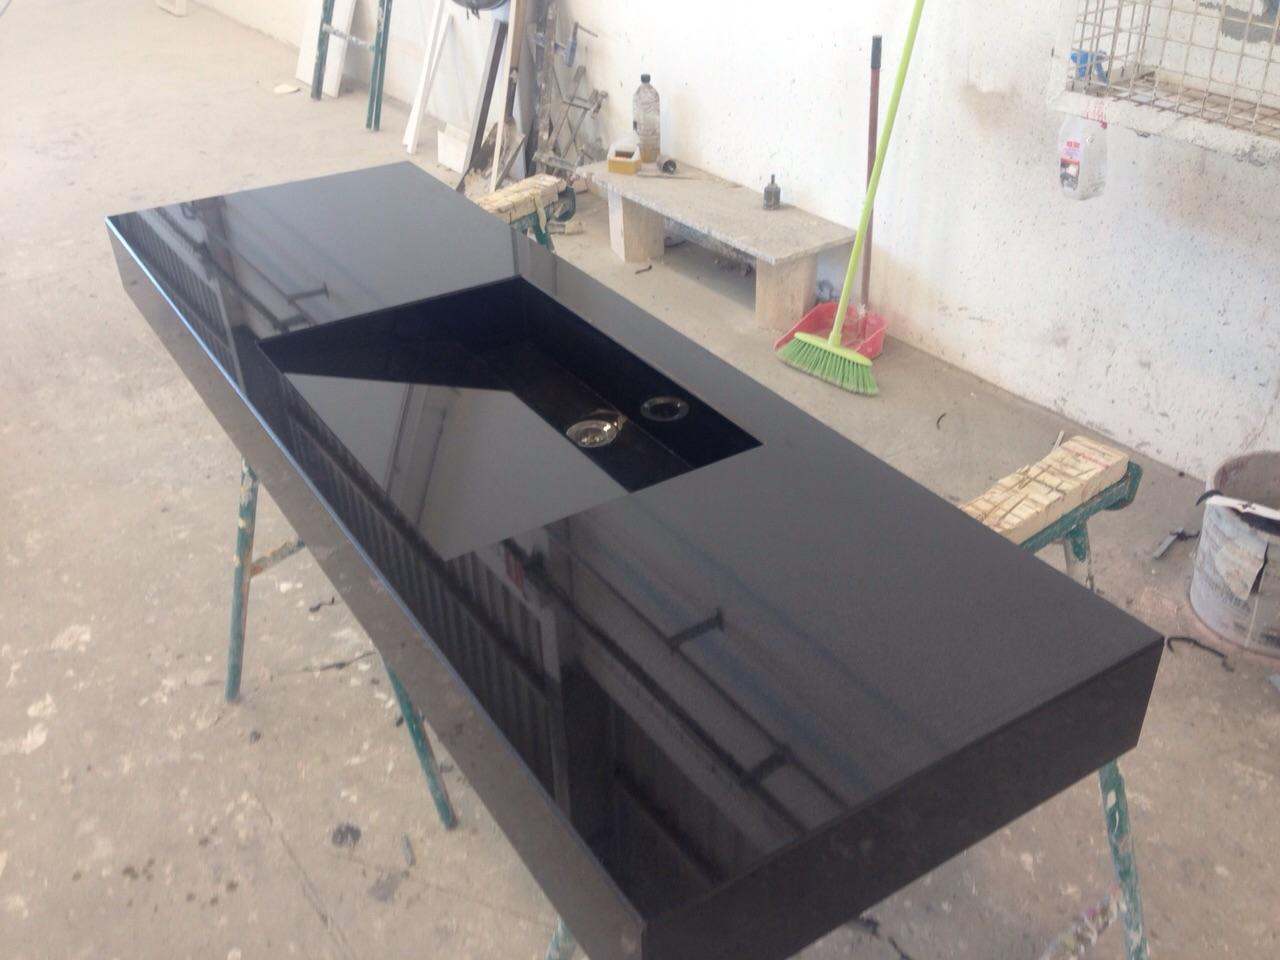 encimera-granito-negro-intenso-de- 12-cm-de-alto-con-fregadero-inclinado